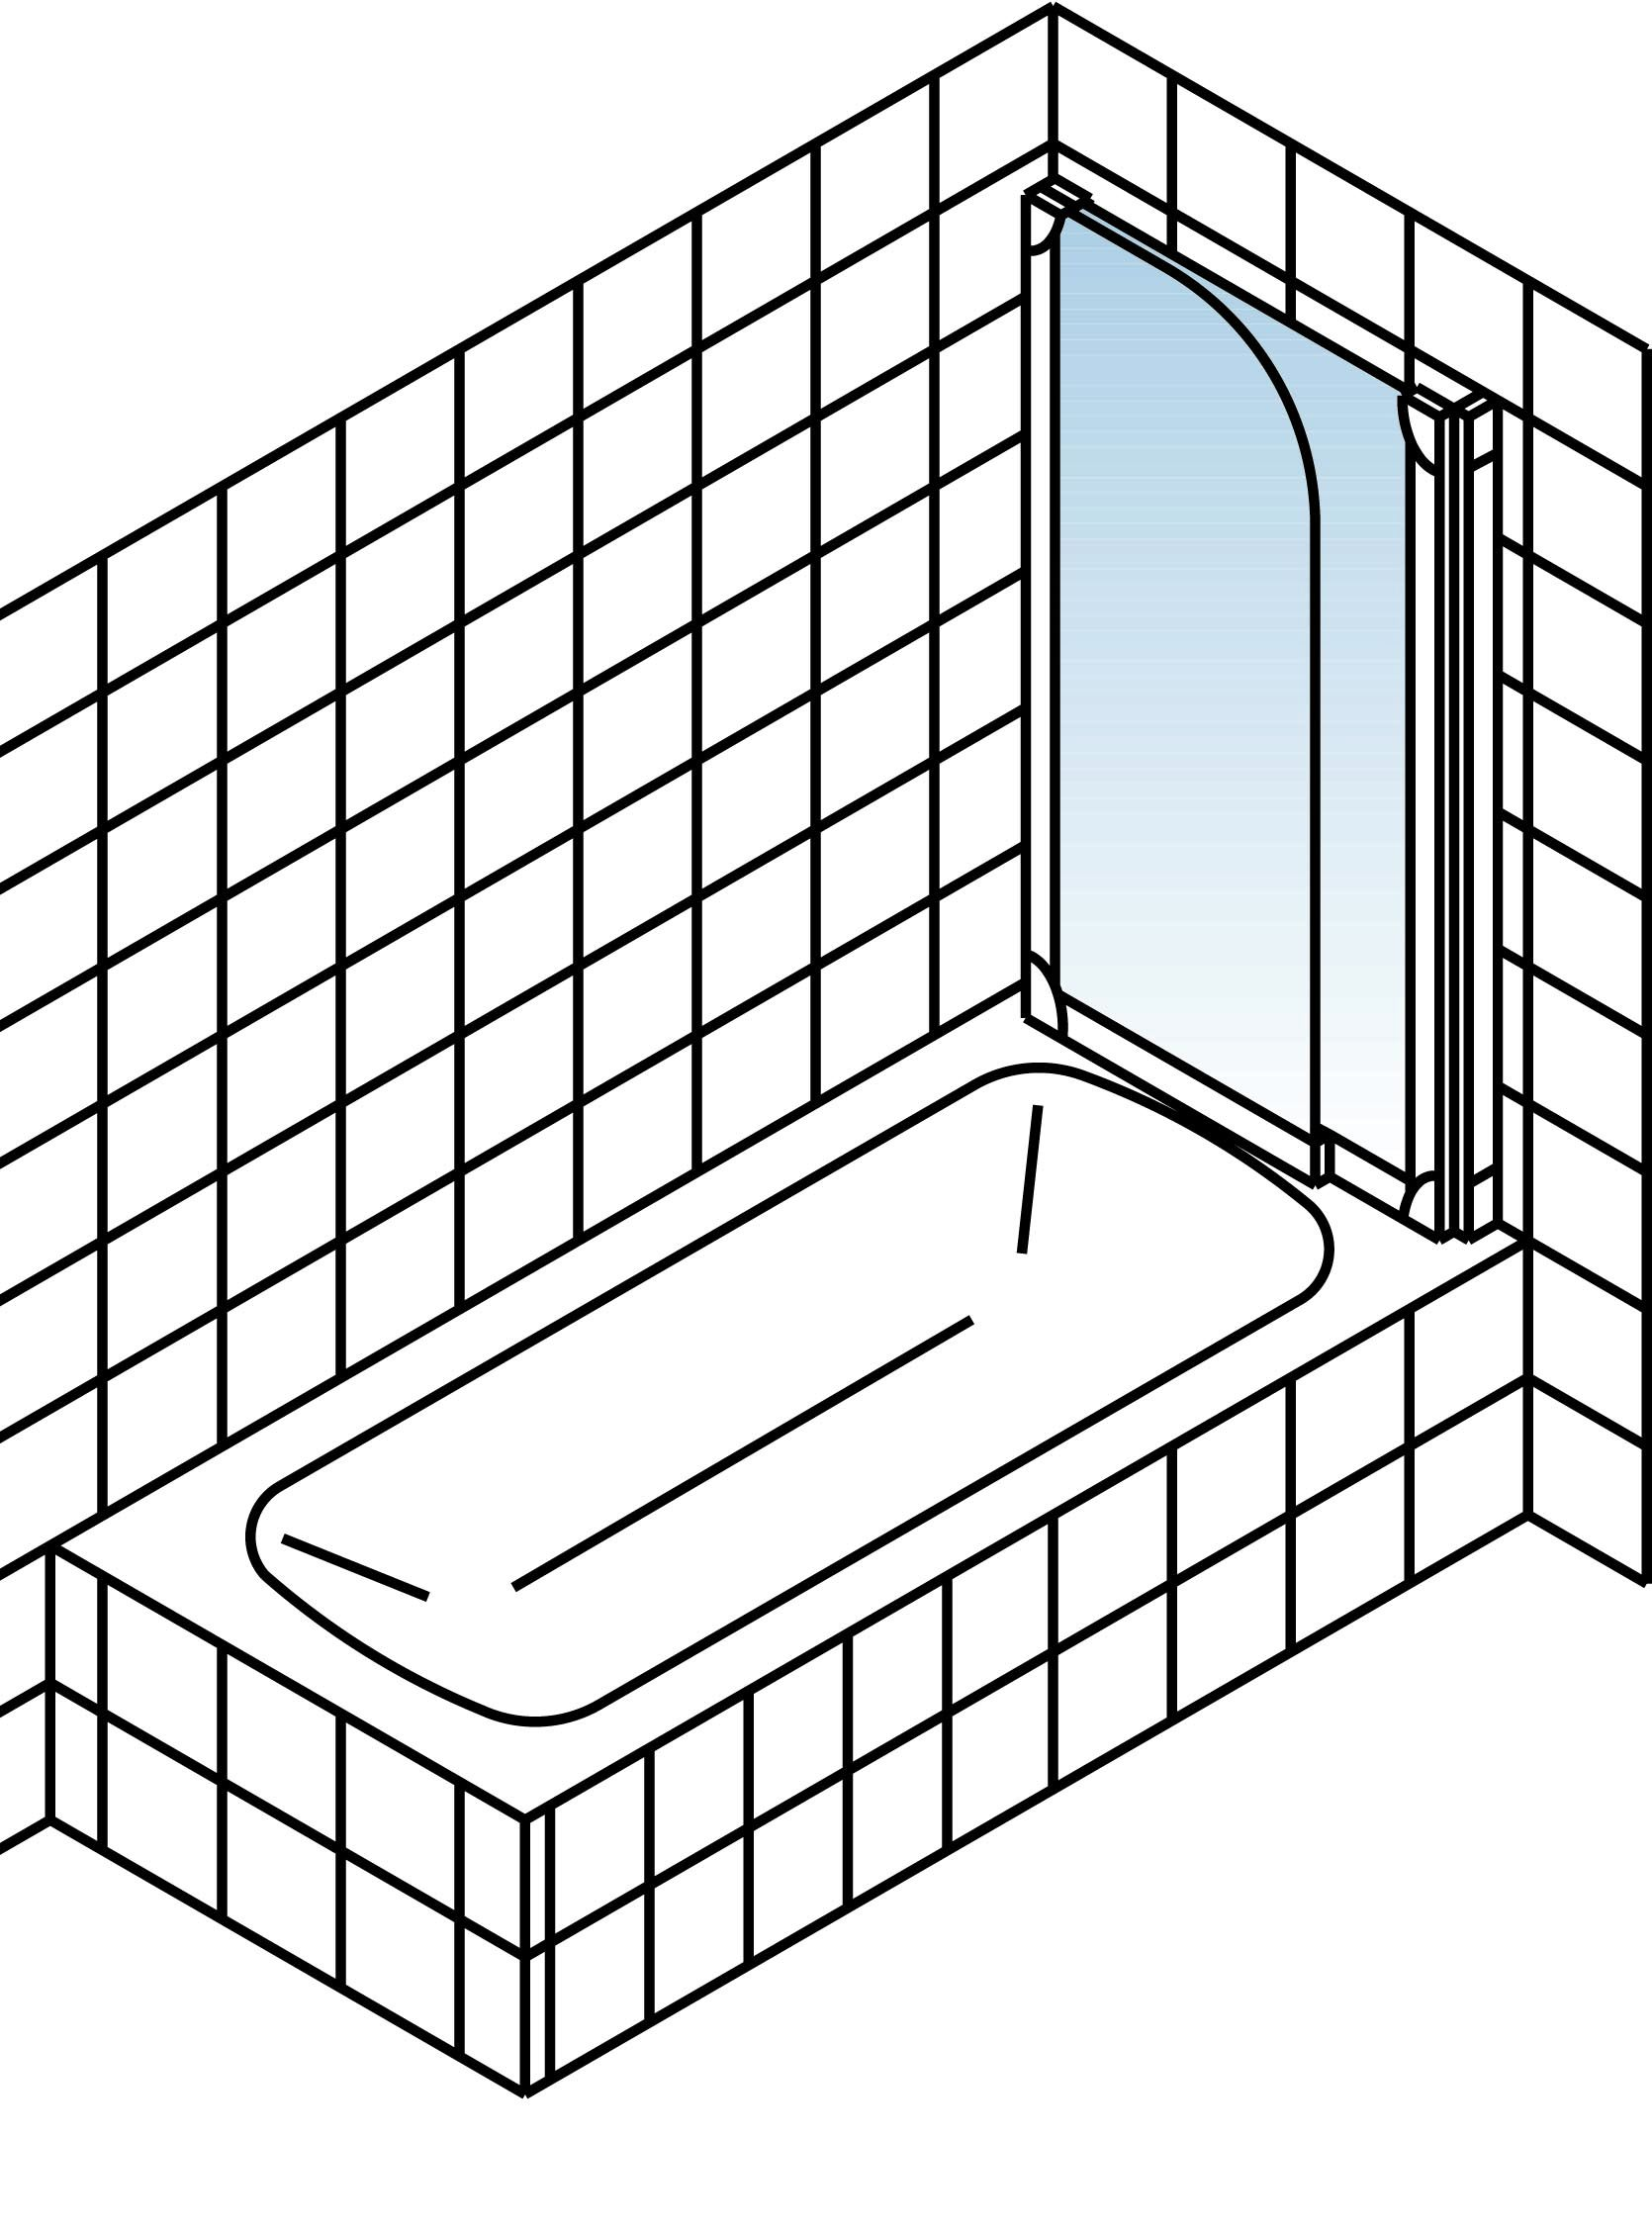 schulte komfort garant badewannenfaltwand 2 teilig klar hell alunatur 1140mm d853 01 50 rechts. Black Bedroom Furniture Sets. Home Design Ideas